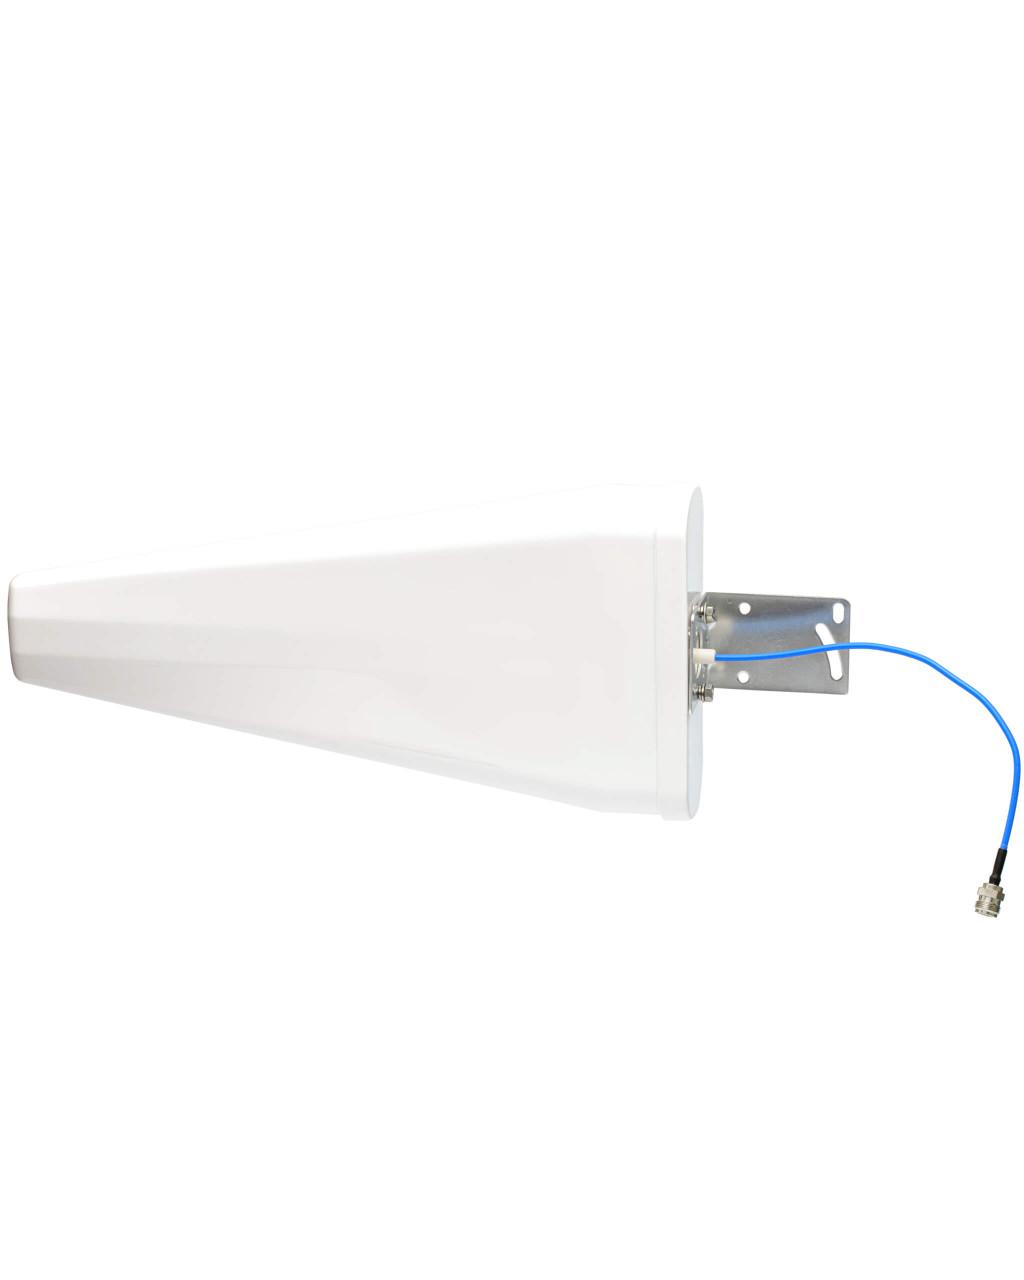 The Quicksilver Yagi Directional Antenna 150 PIM